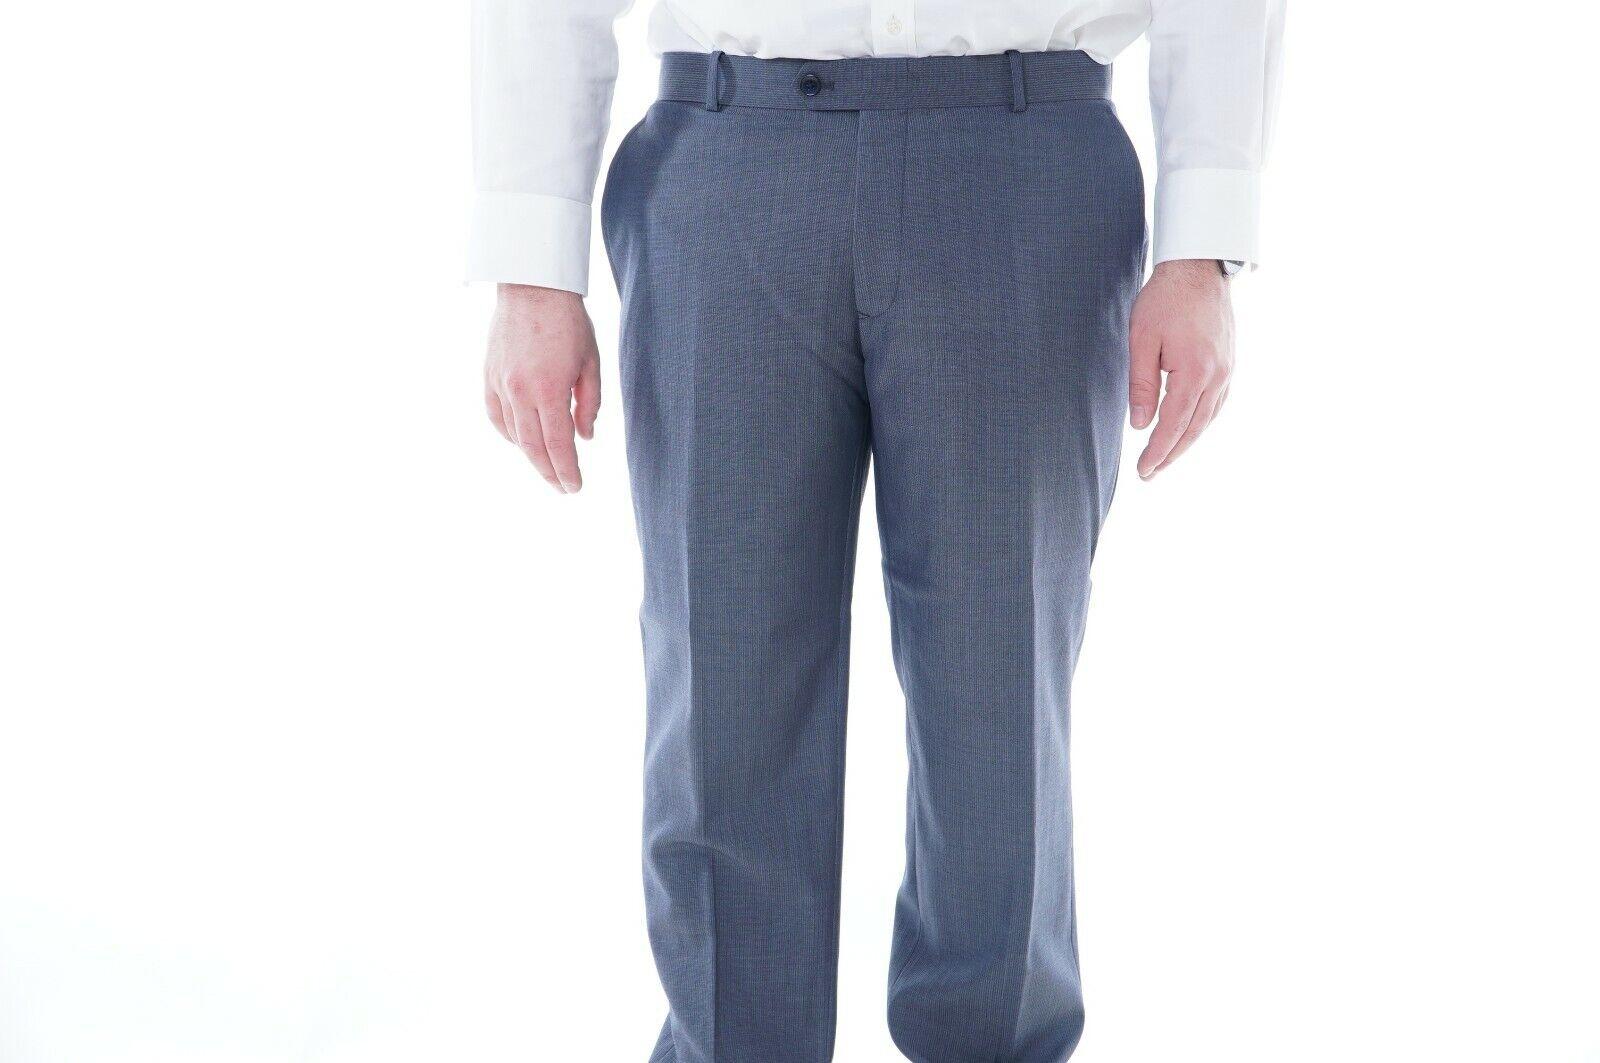 Bar III Slim Fit bluee Striped Wool Blend Flat Front Dress Pants 30x32